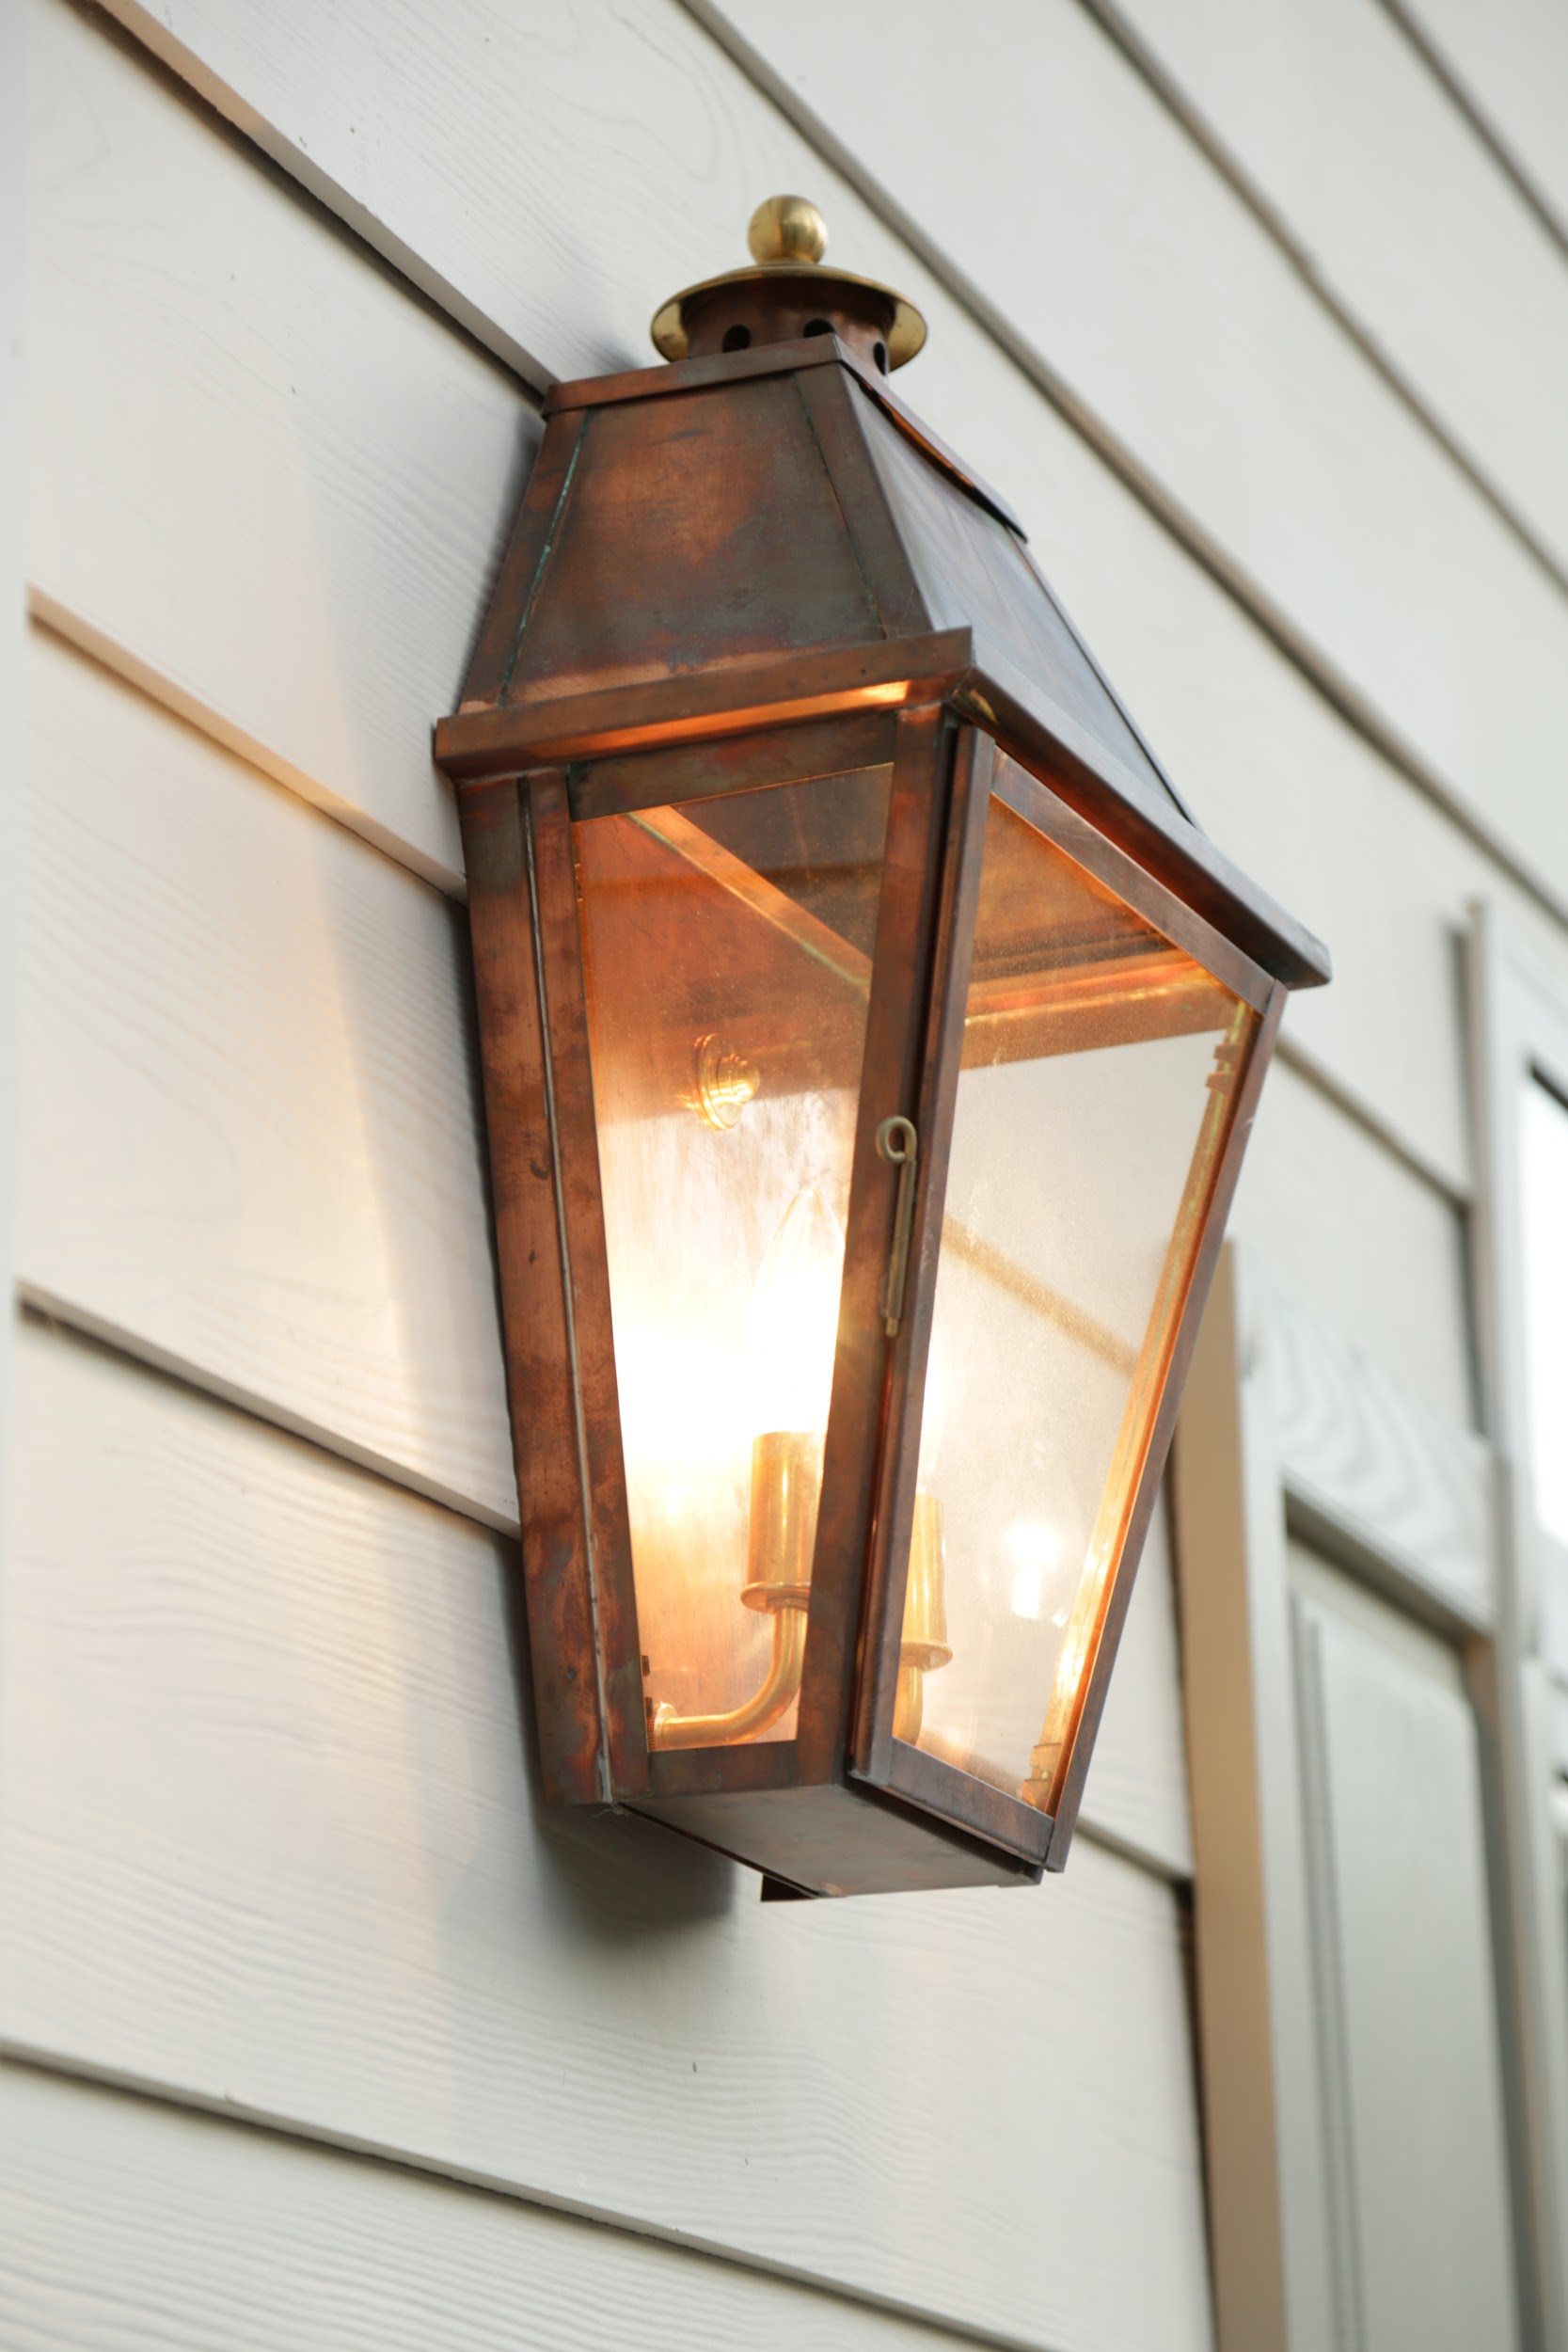 Copper Lighting: Copper Works Lighting Company